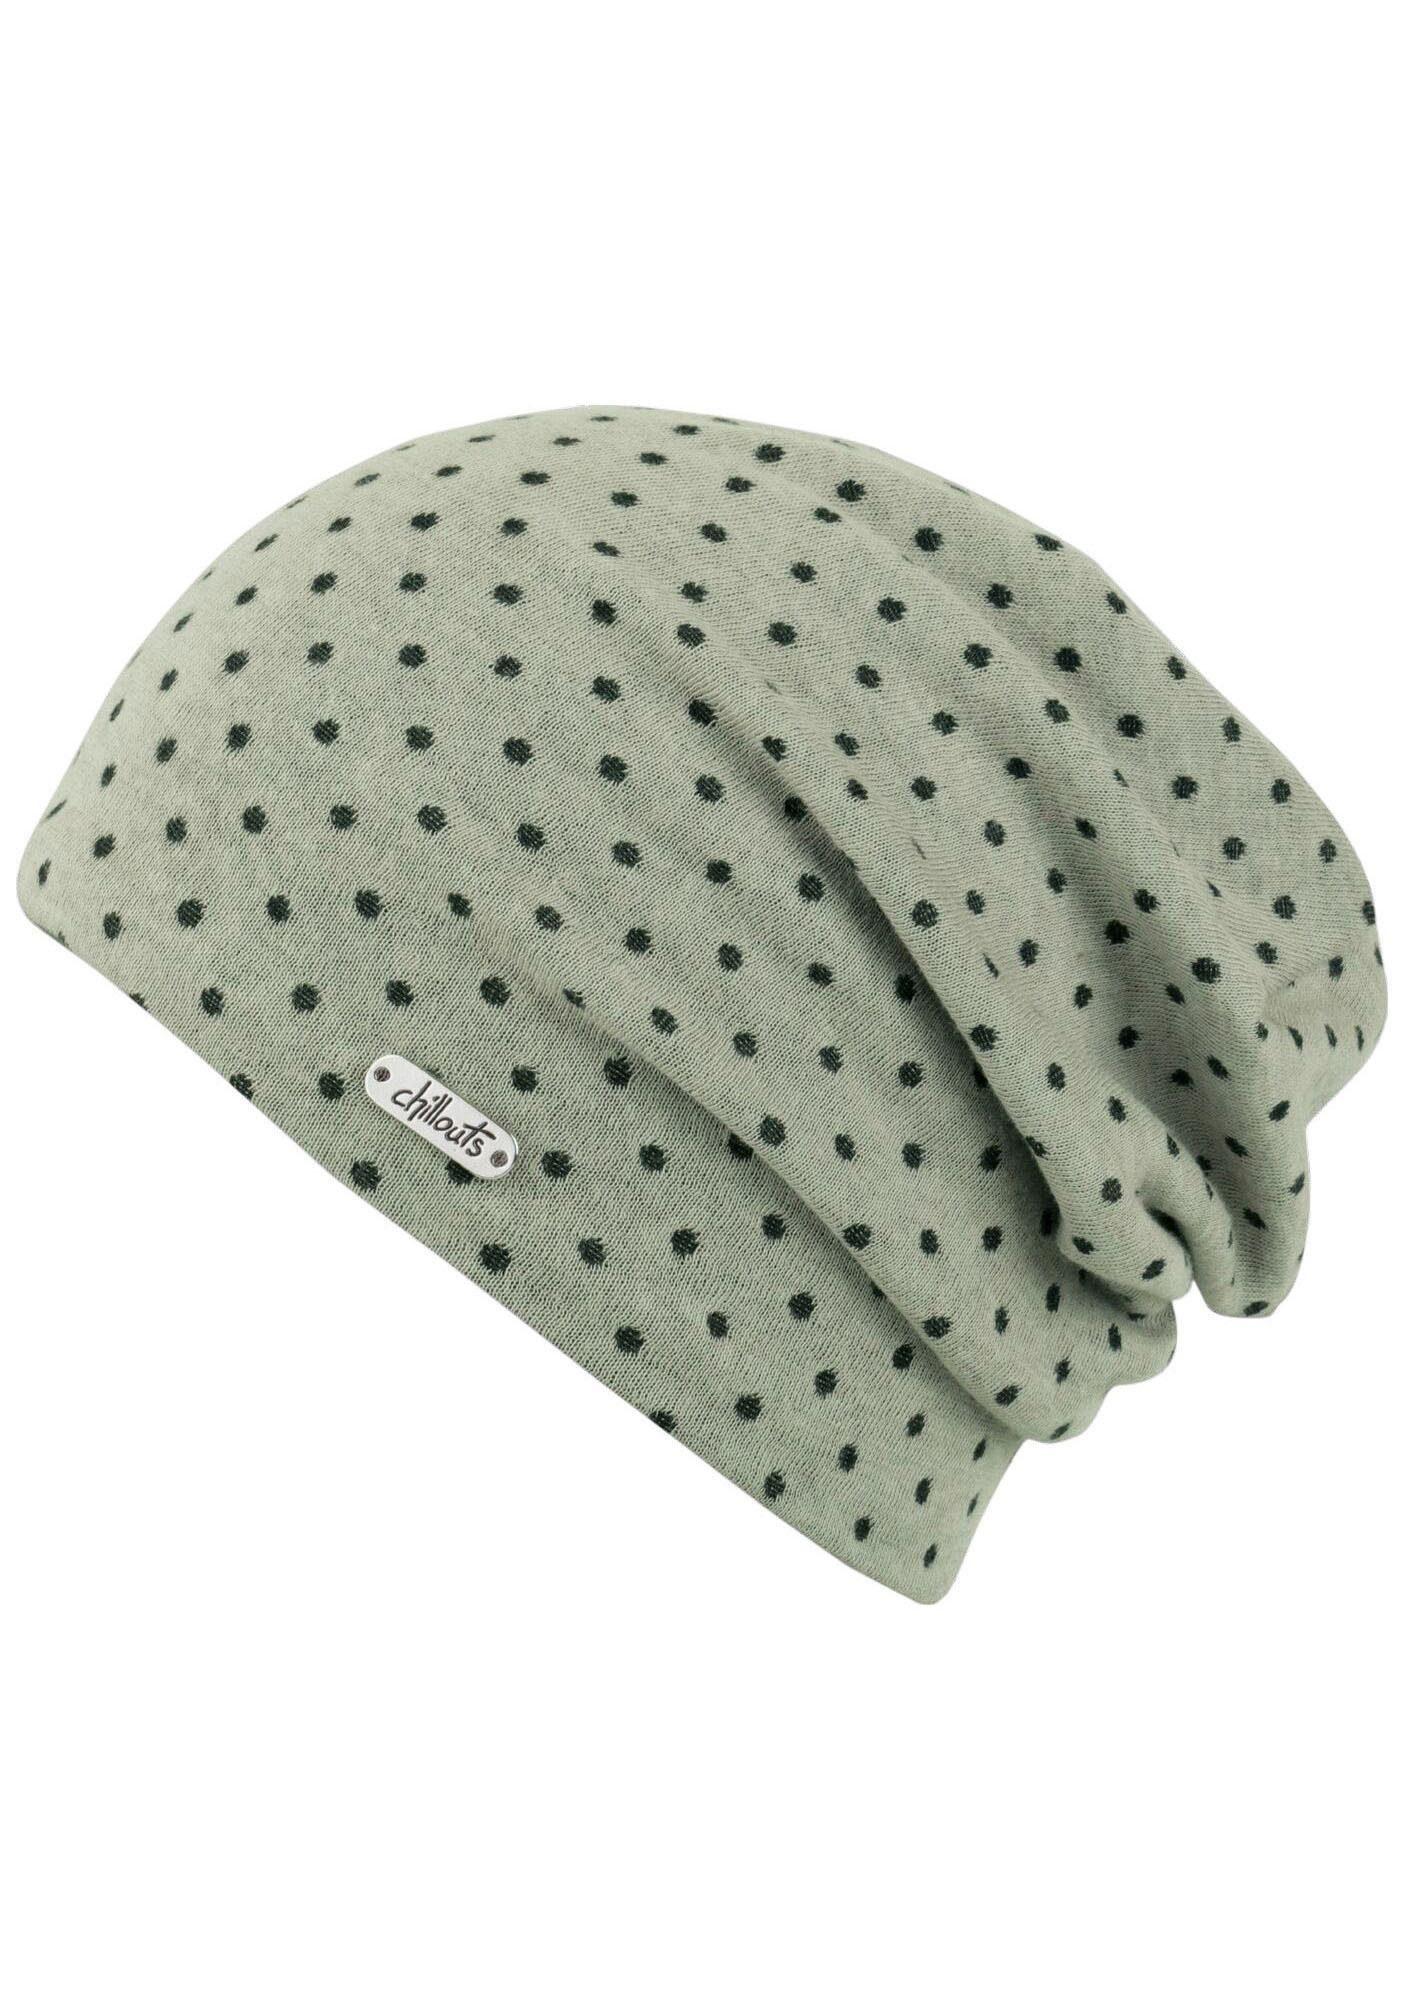 chillouts Beanie Johannesburg Hat